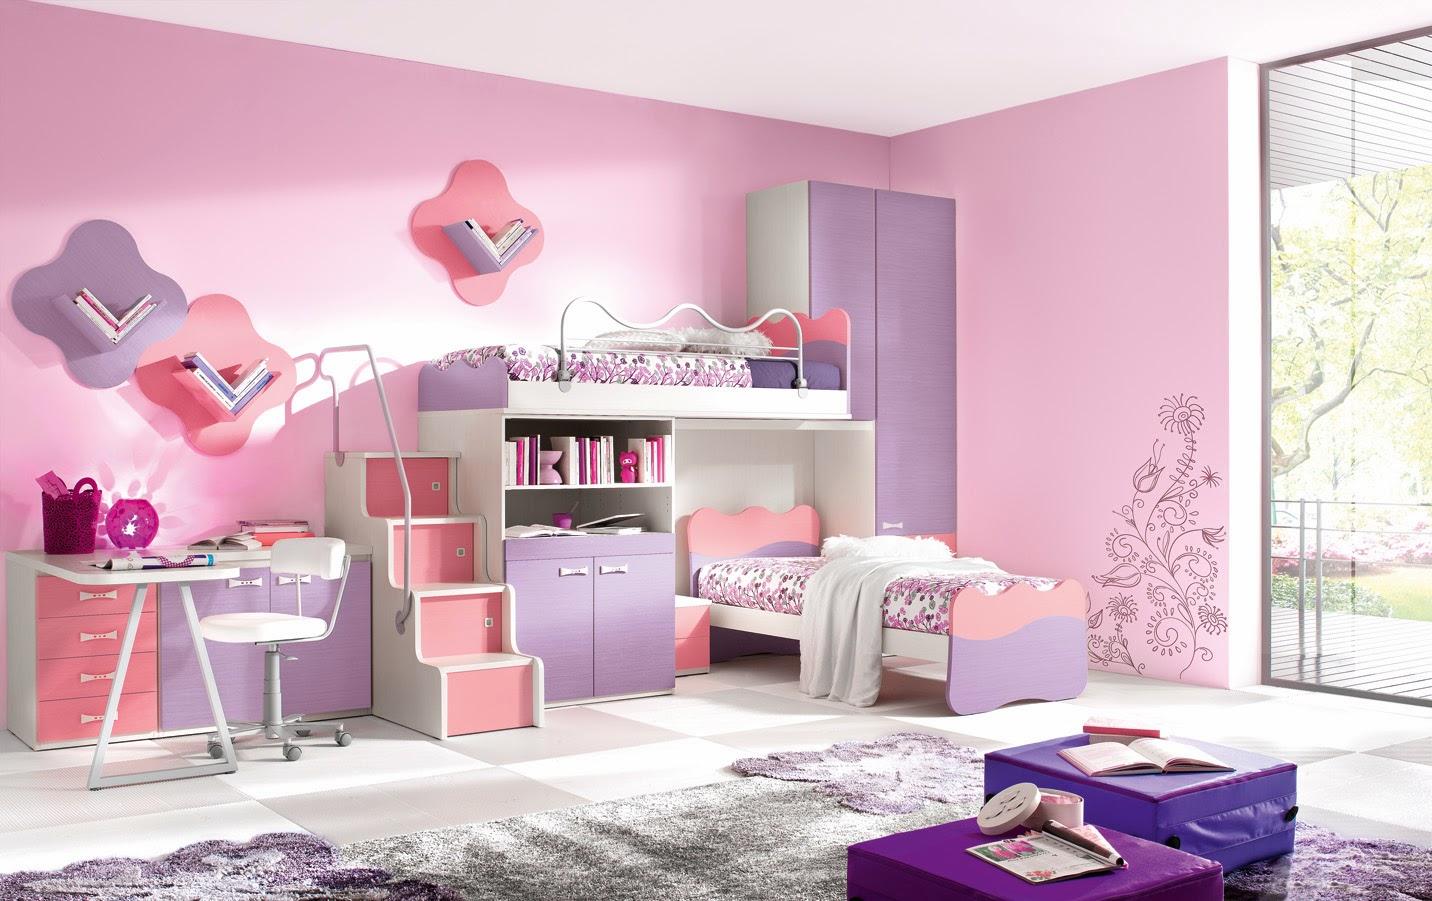 Inspiring Kids Bedroom with Brilliant Interior Decor Idea